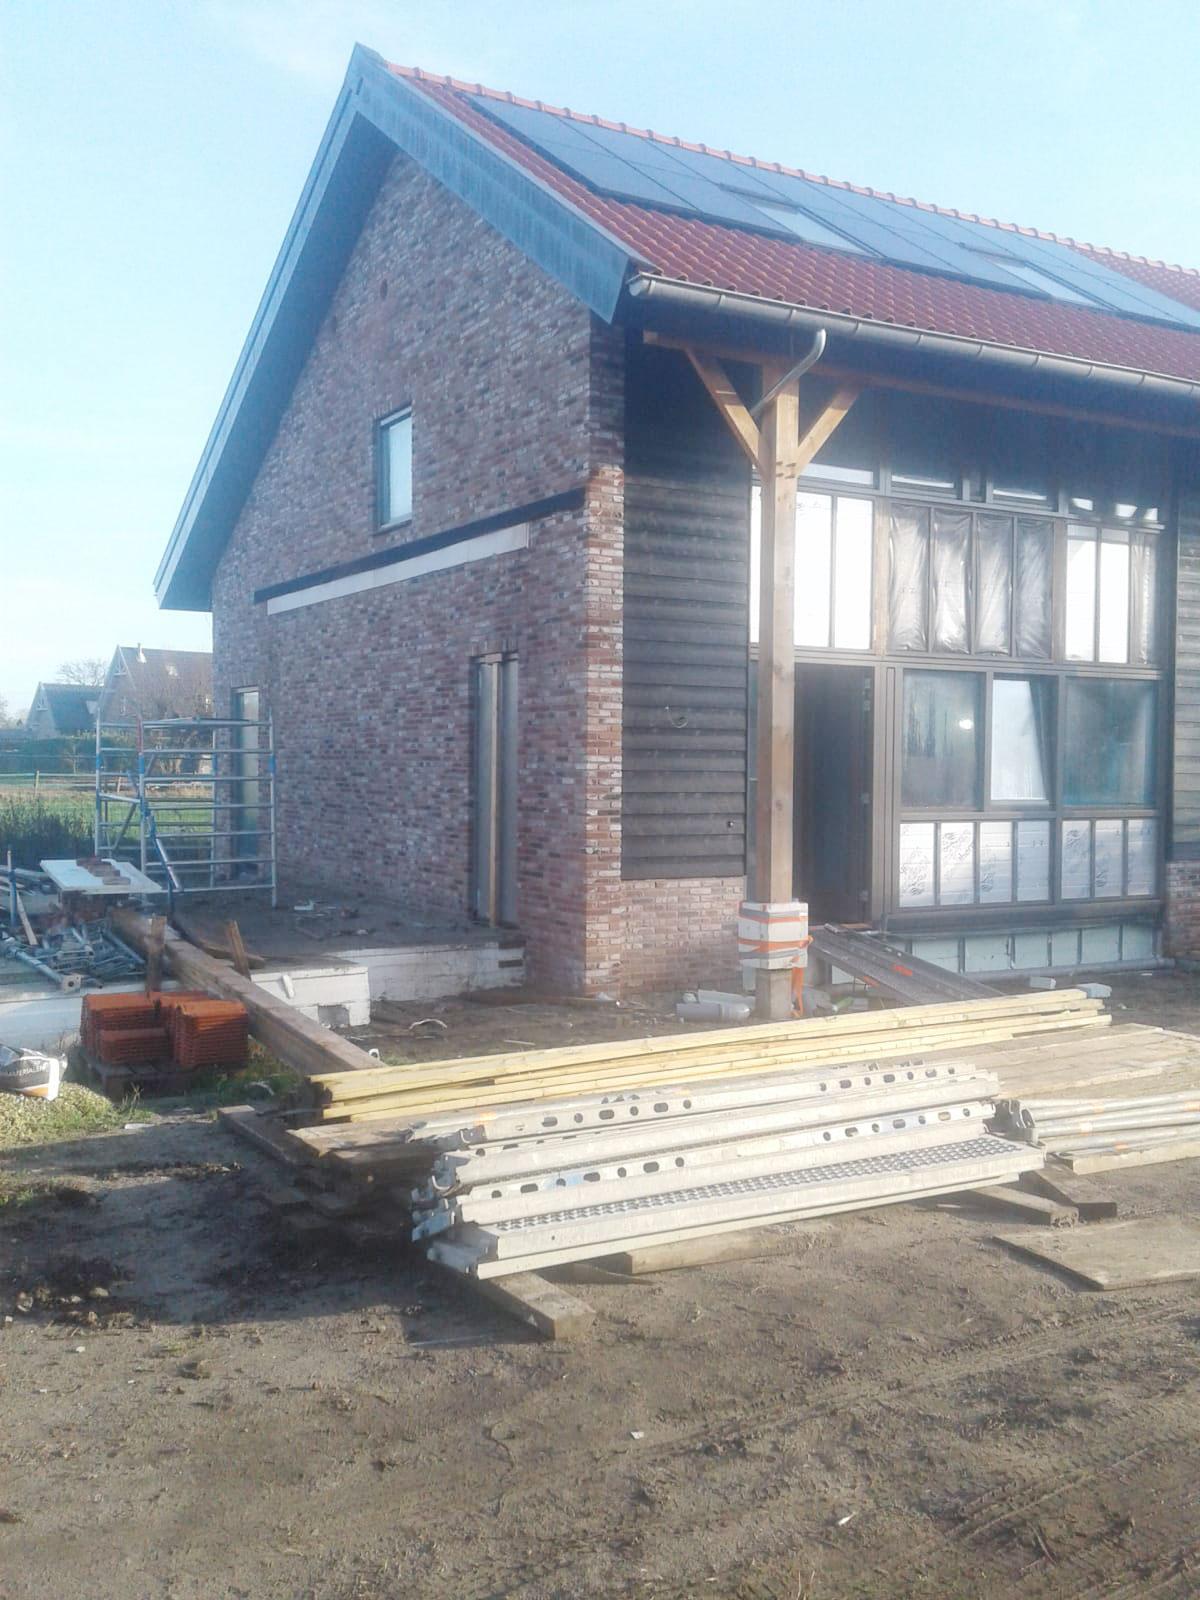 bouwupdate - Veldschuur Soester Erf Soest